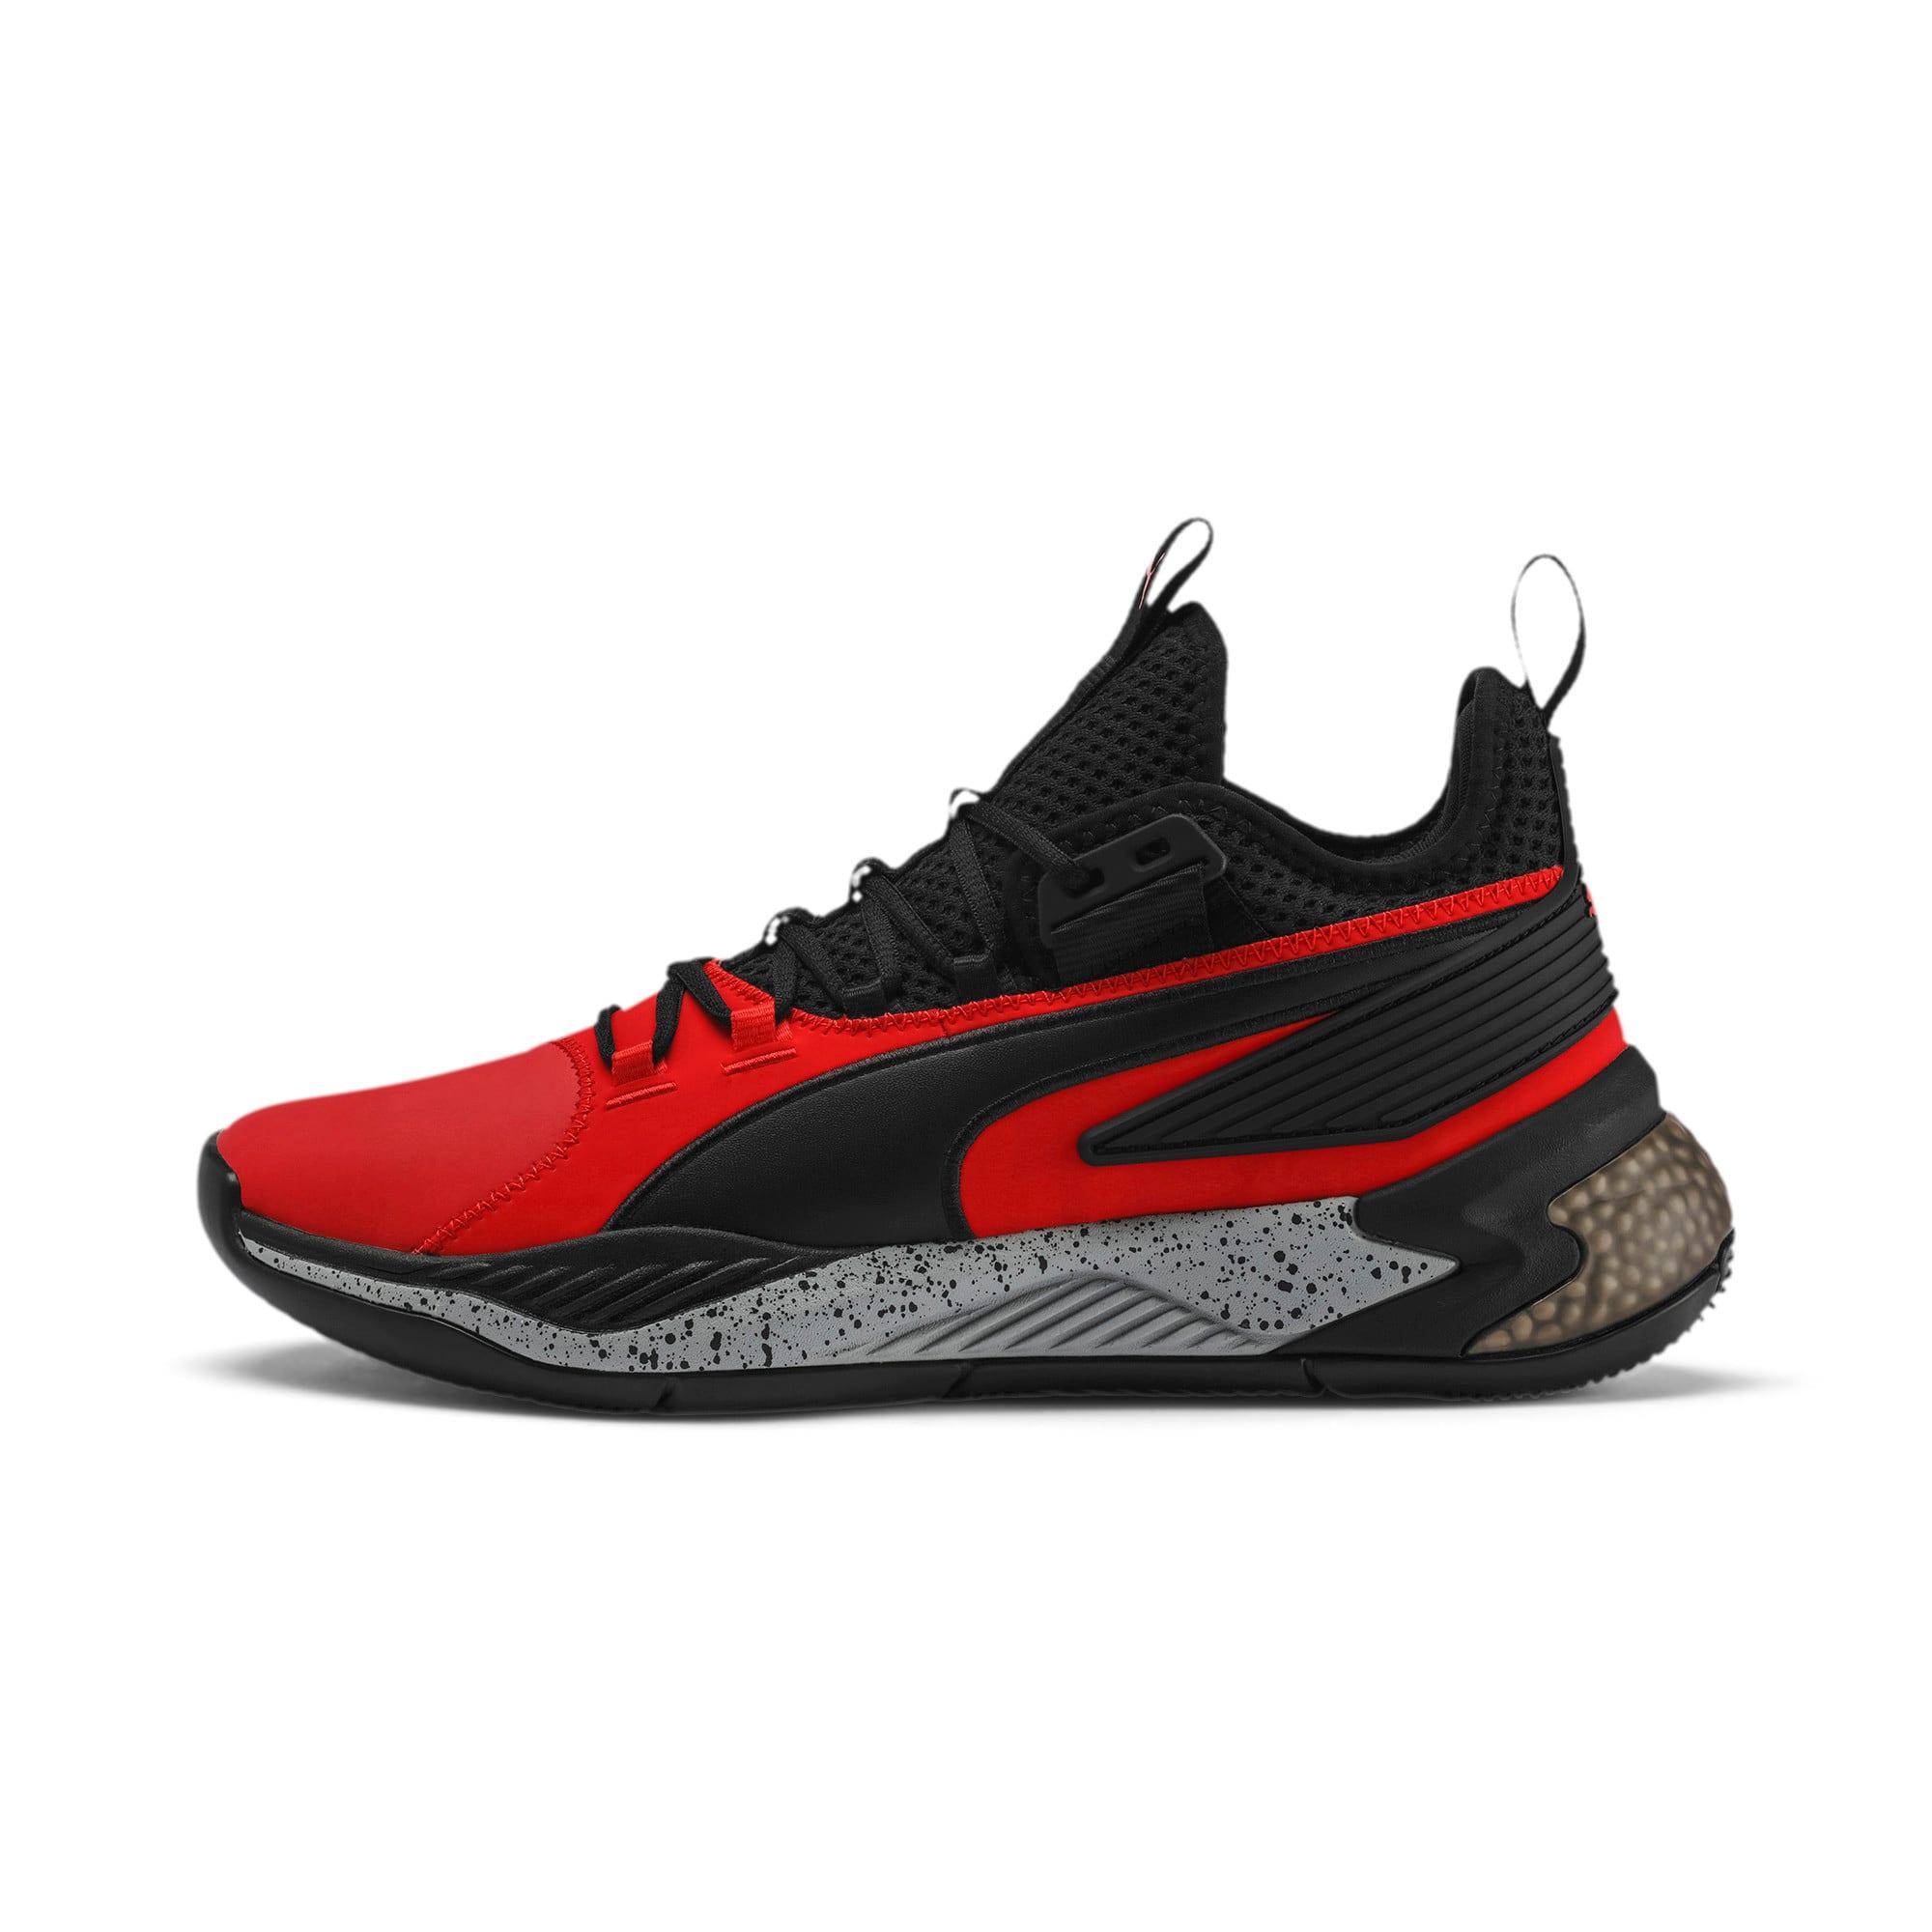 Thumbnail 1 of Uproar Core Men's Basketball Shoes, High Risk Red-Puma Black, medium